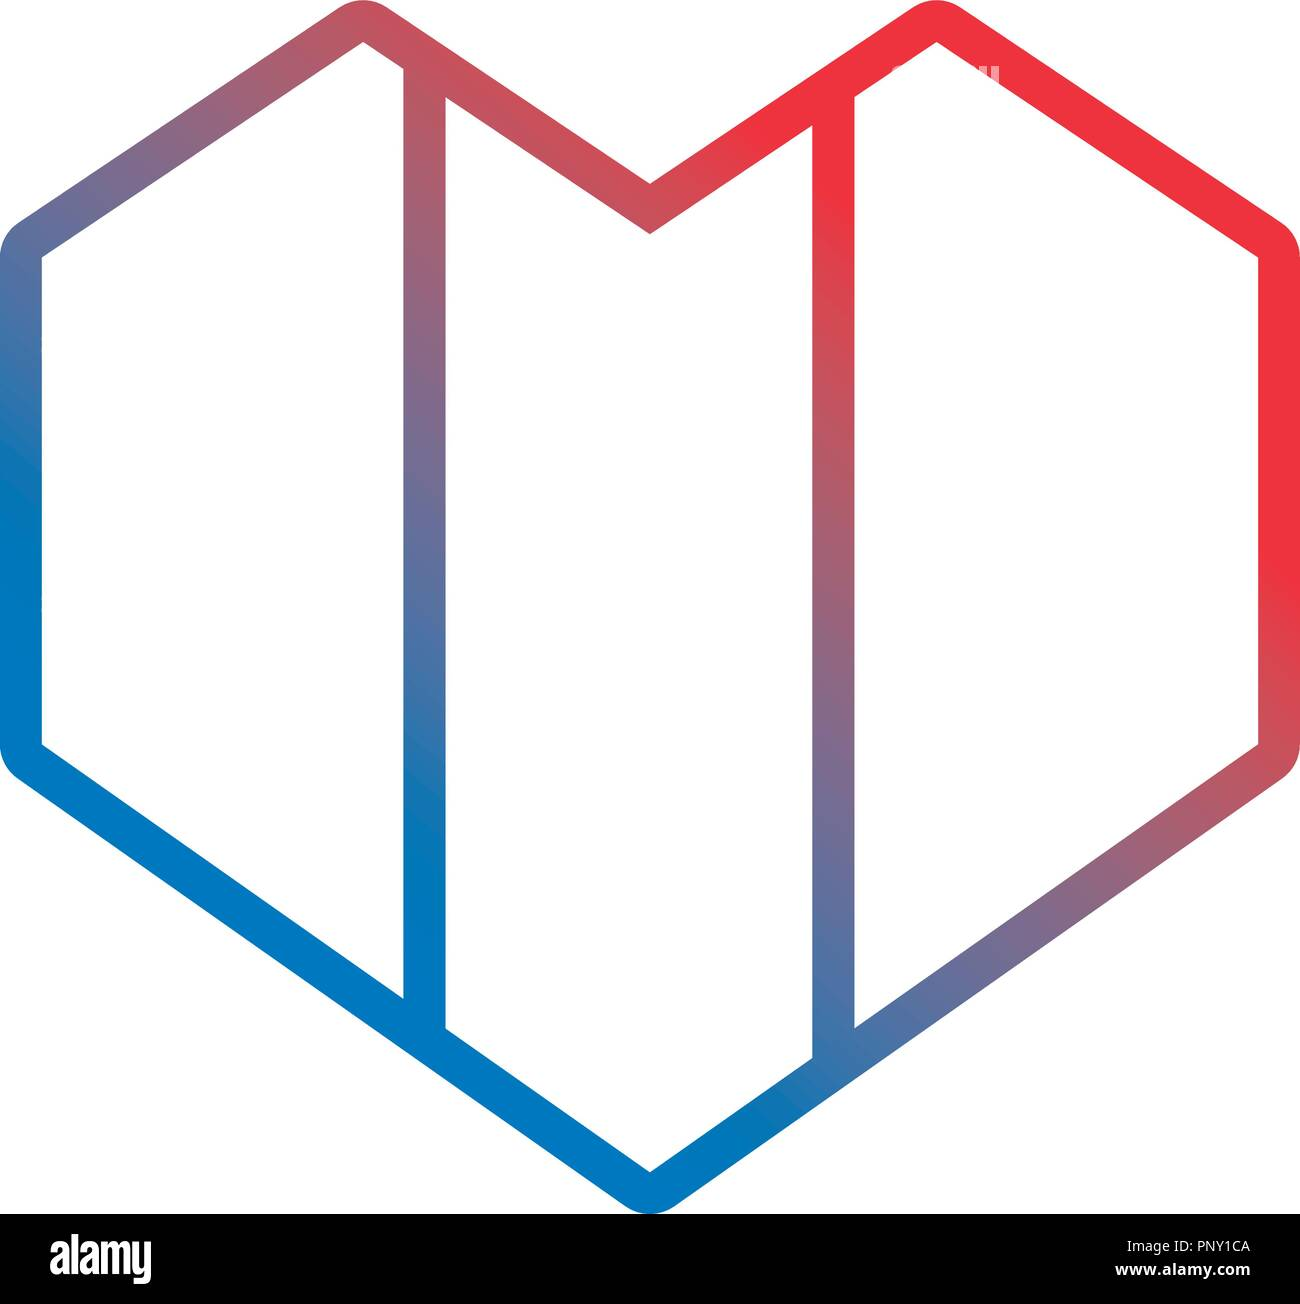 french flag heart geometric symbol vector illustration neon - Stock Image